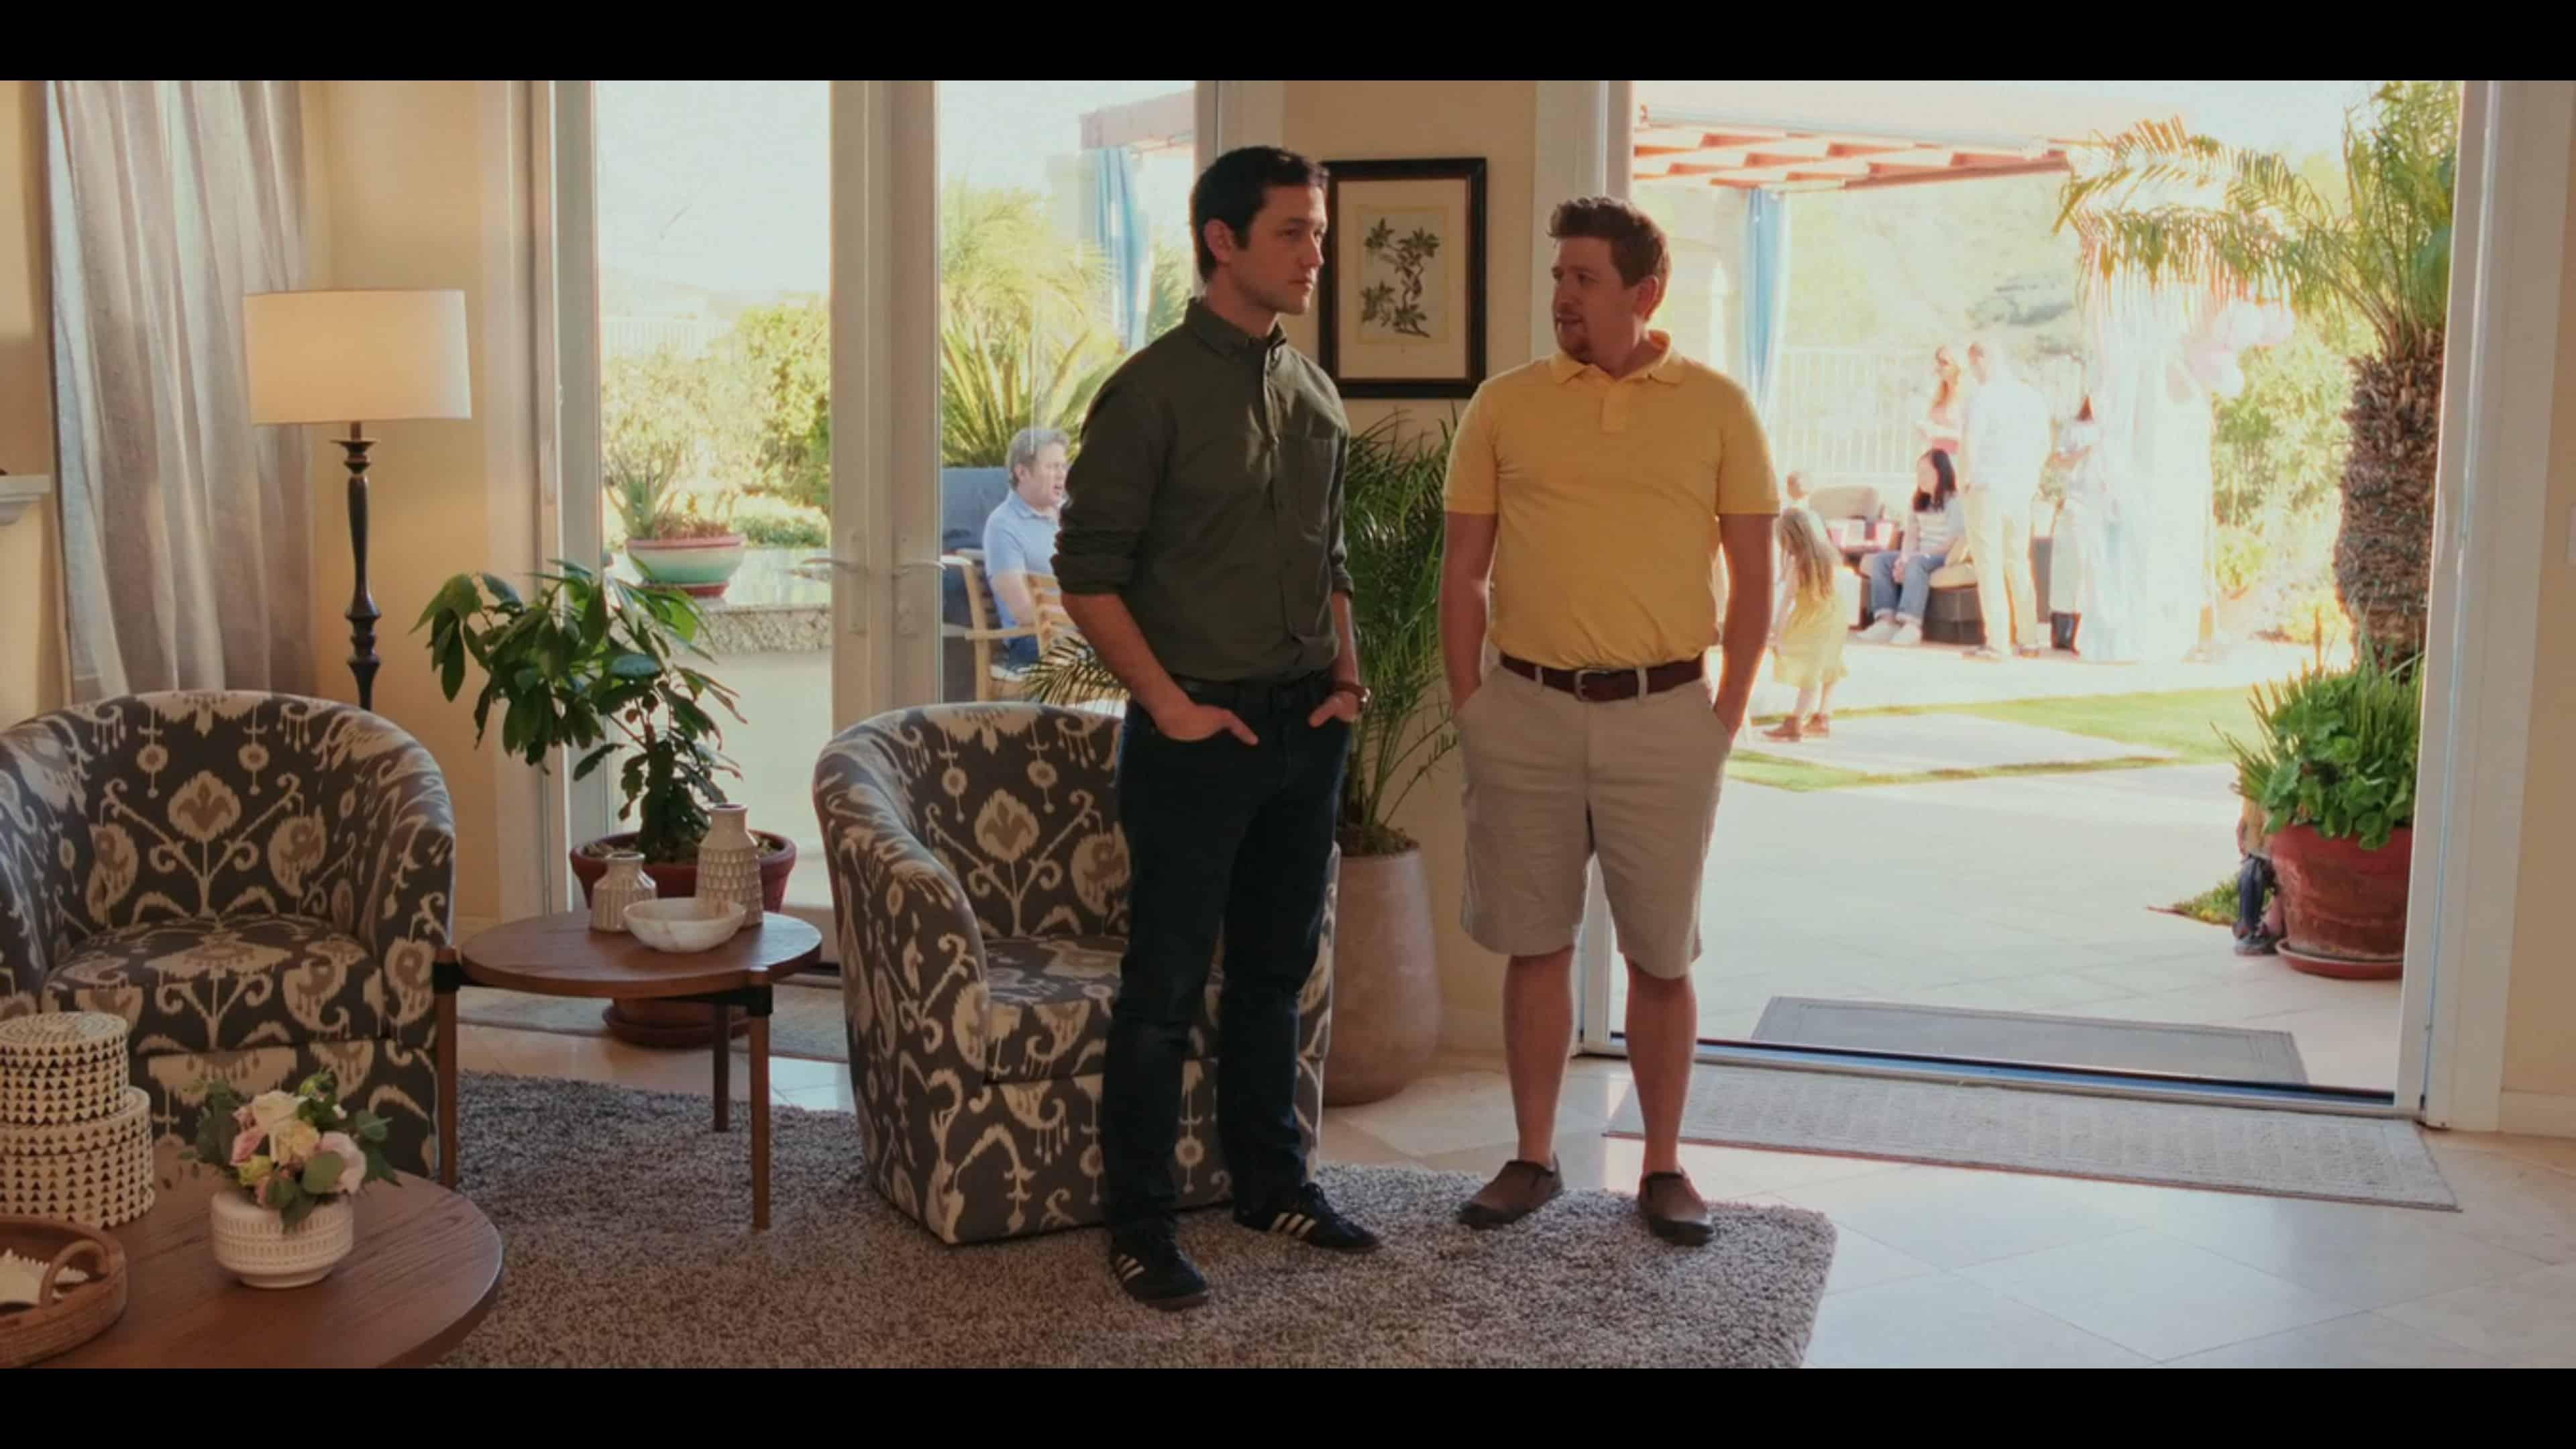 Josh and Aaron (Jonathan Runyon) talking about Aaron's new car